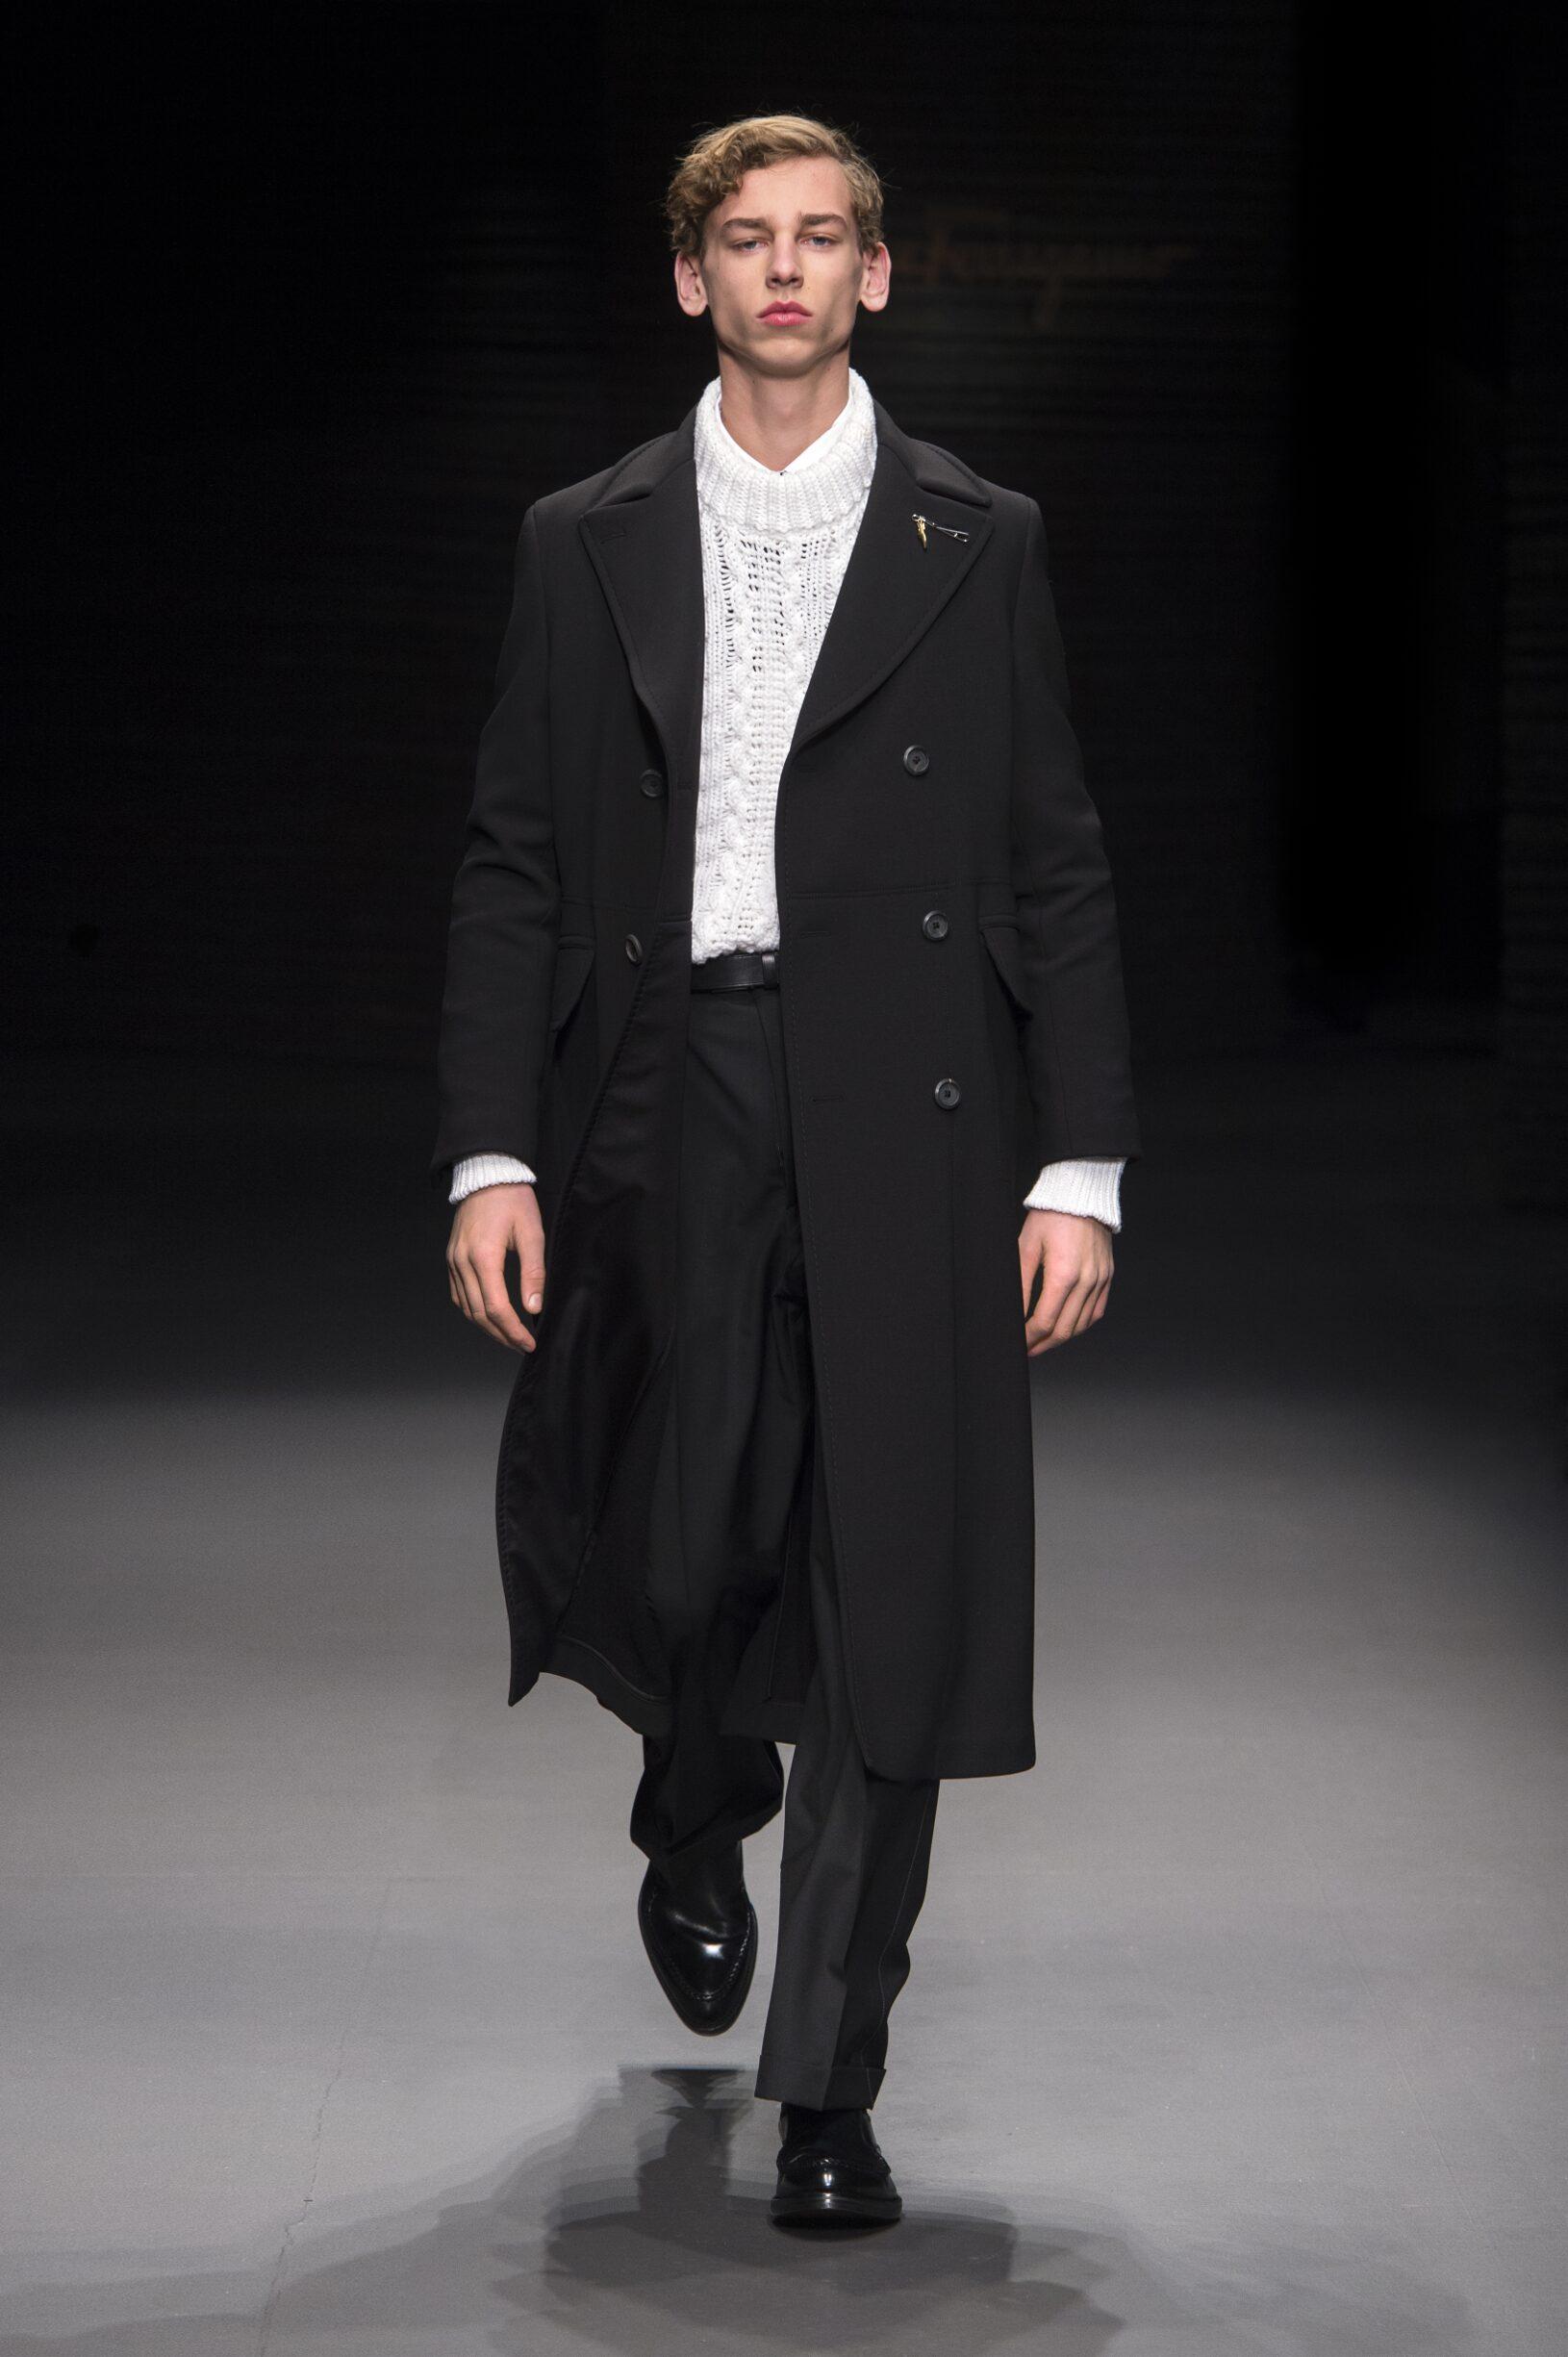 2017 Catwalk Salvatore Ferragamo Man Fashion Show Winter